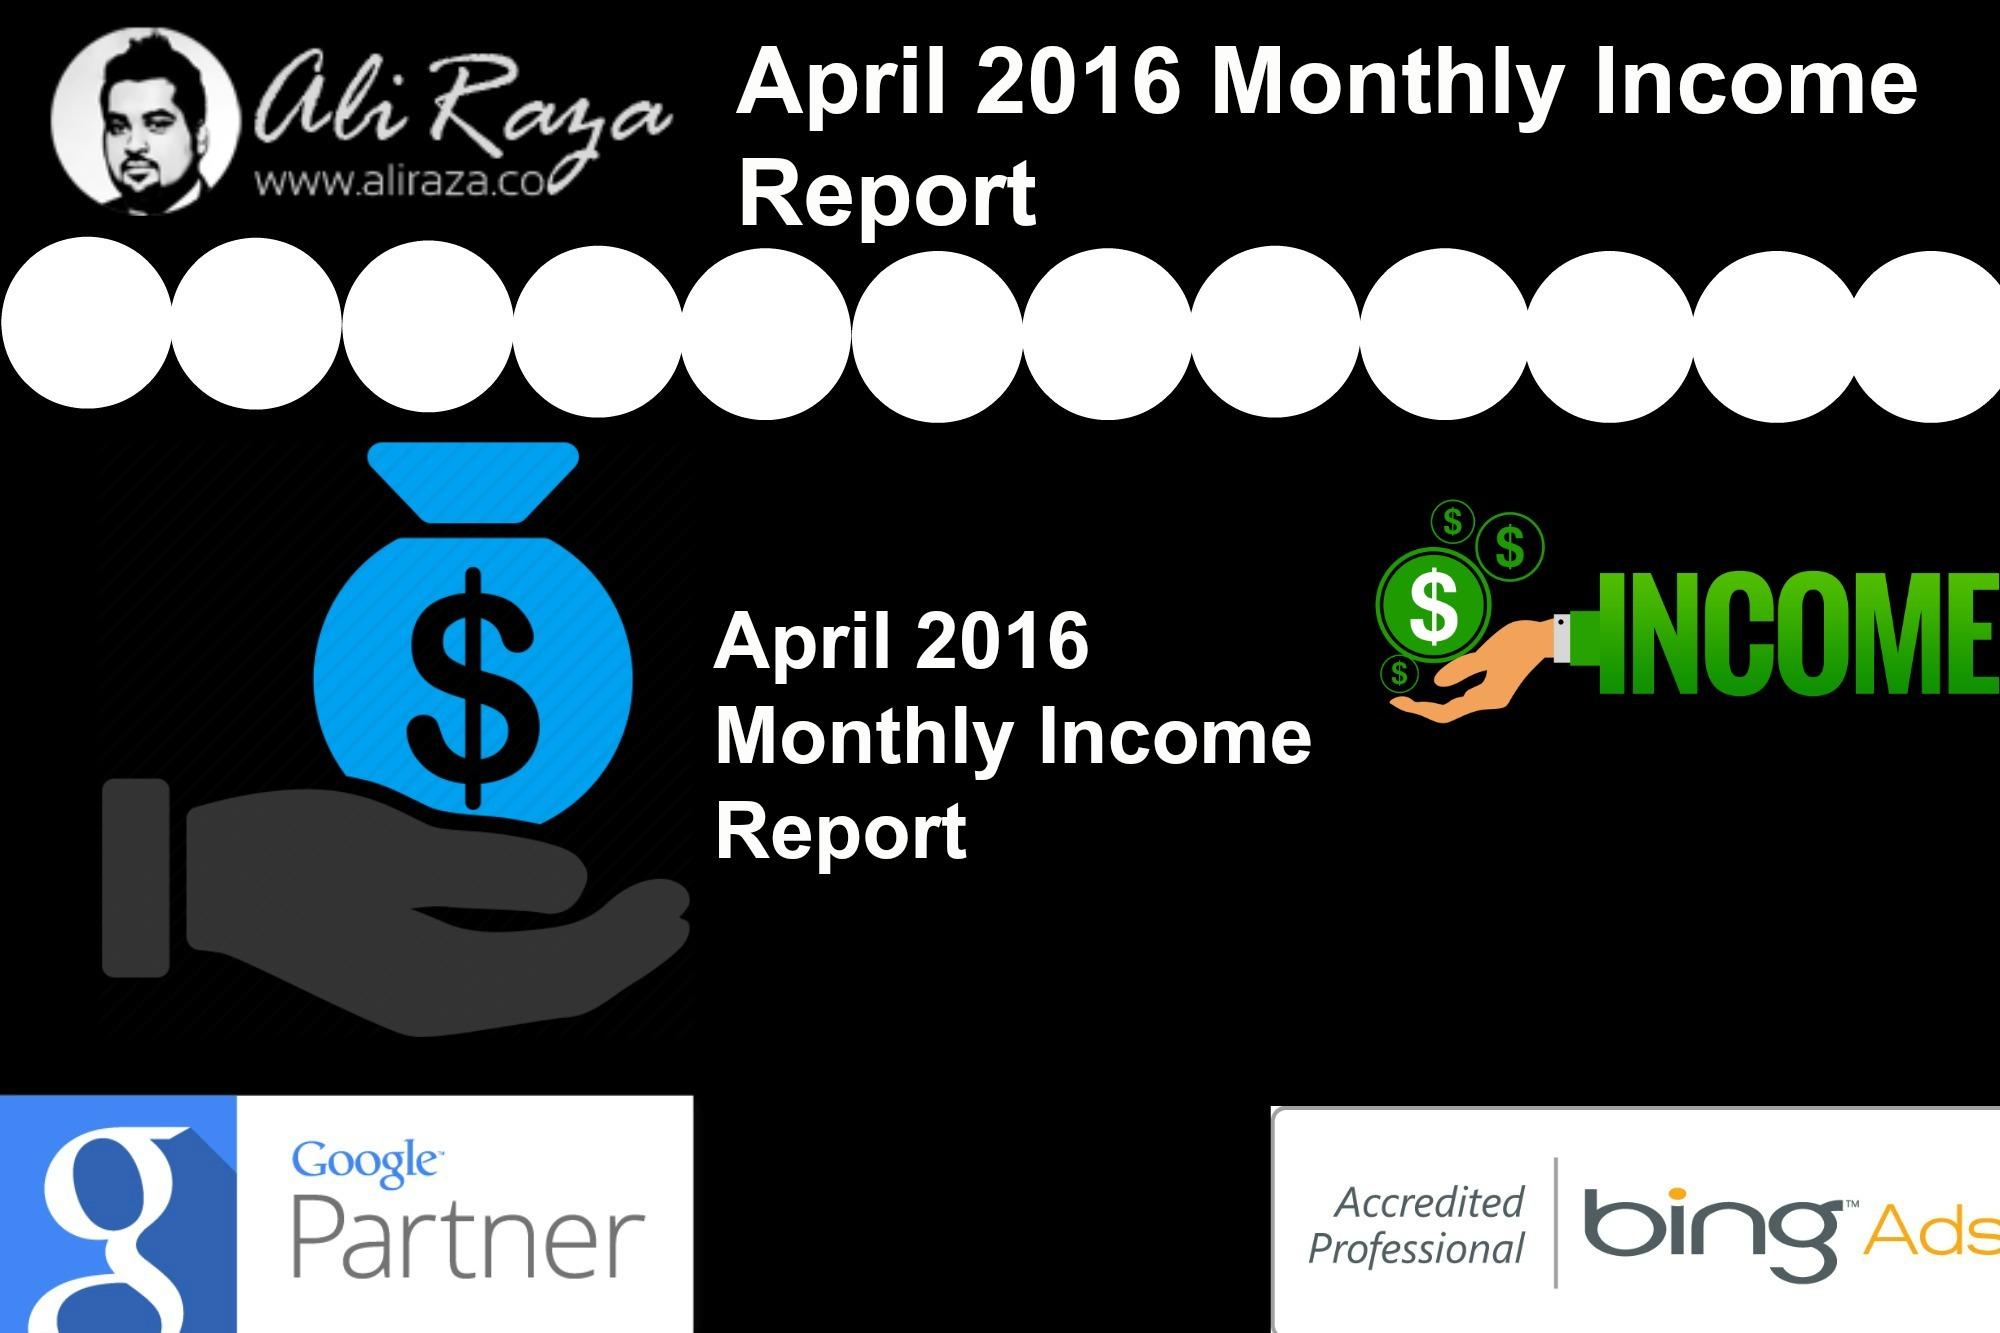 april 2016 monthly income report aliraza.co